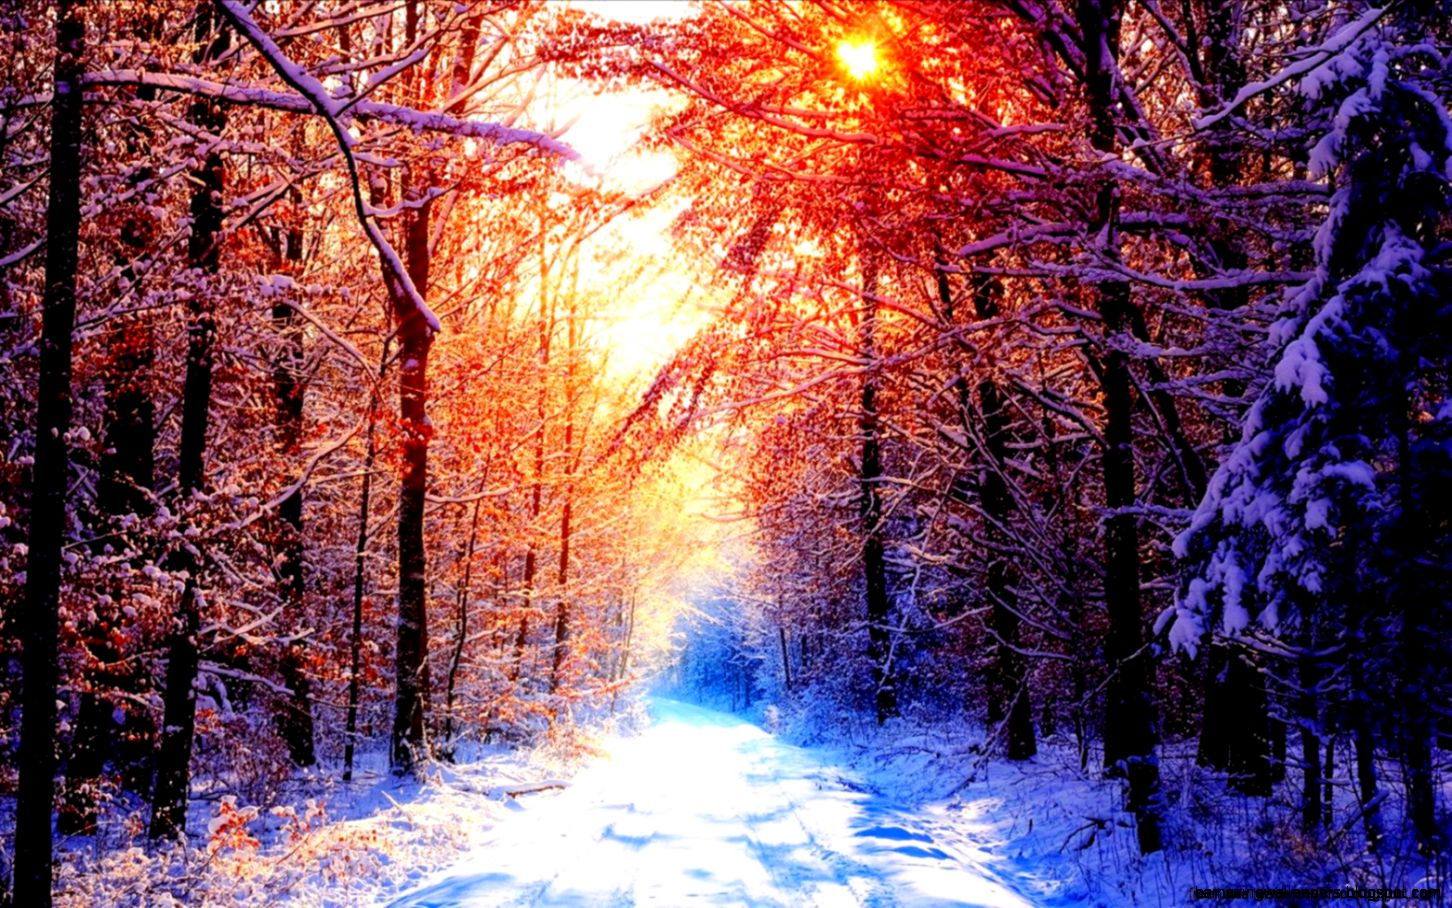 Winter Snow Scenes Sunset